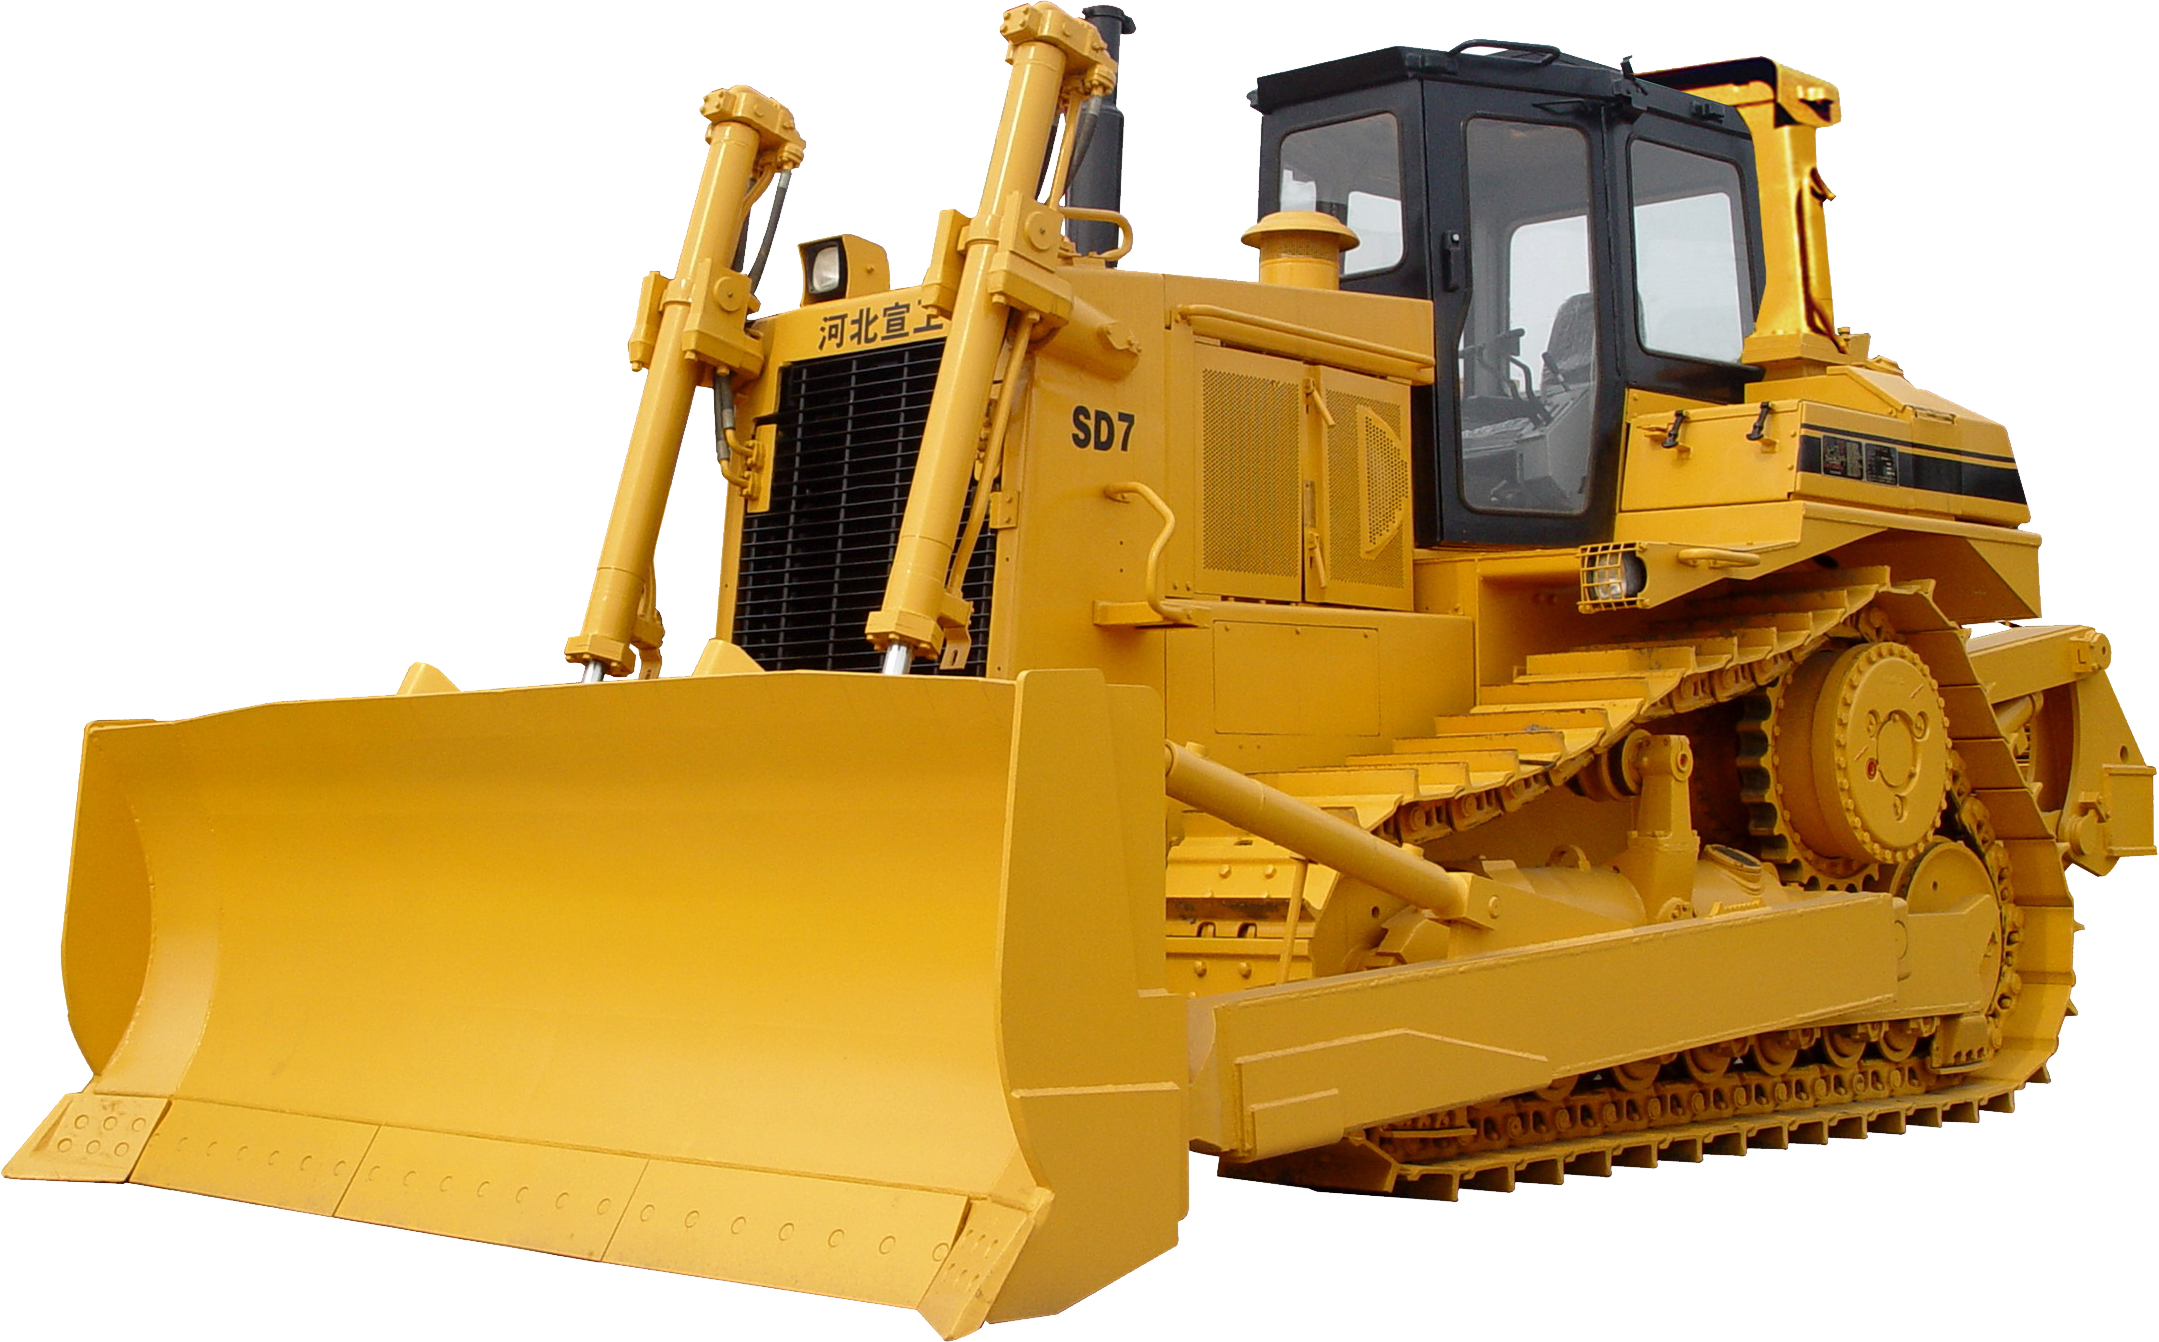 Bulldozer PNG - Bulldozer HD PNG